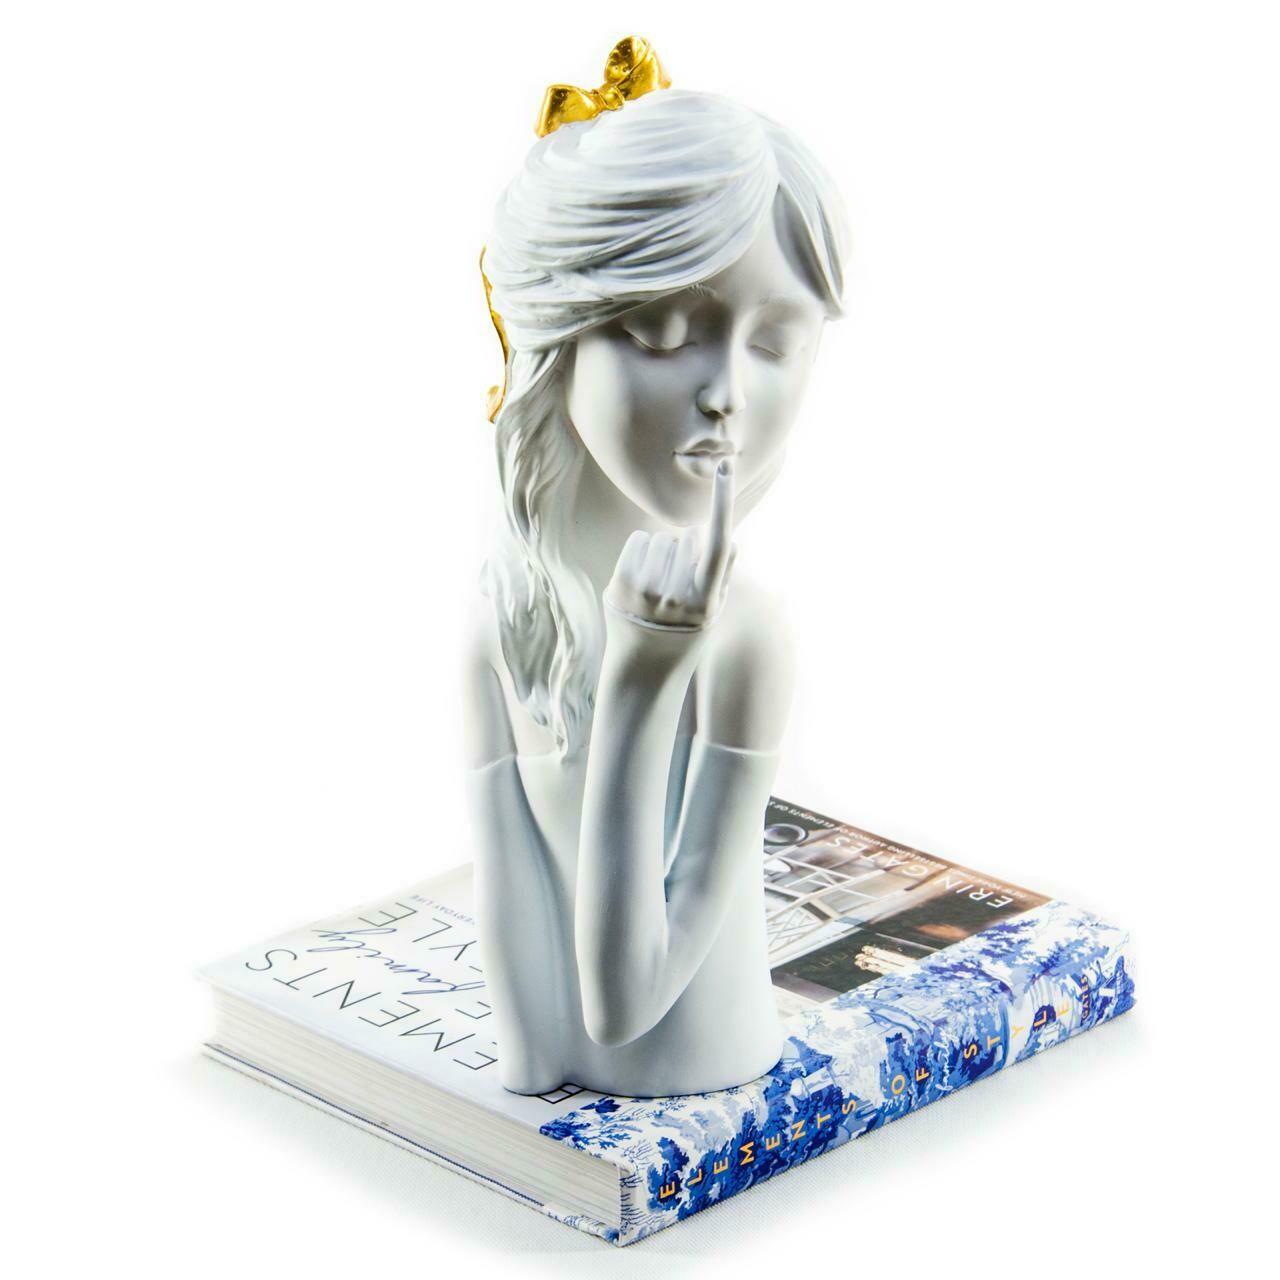 Gold Ribbon Girl Sculpture - Cool Ornaments